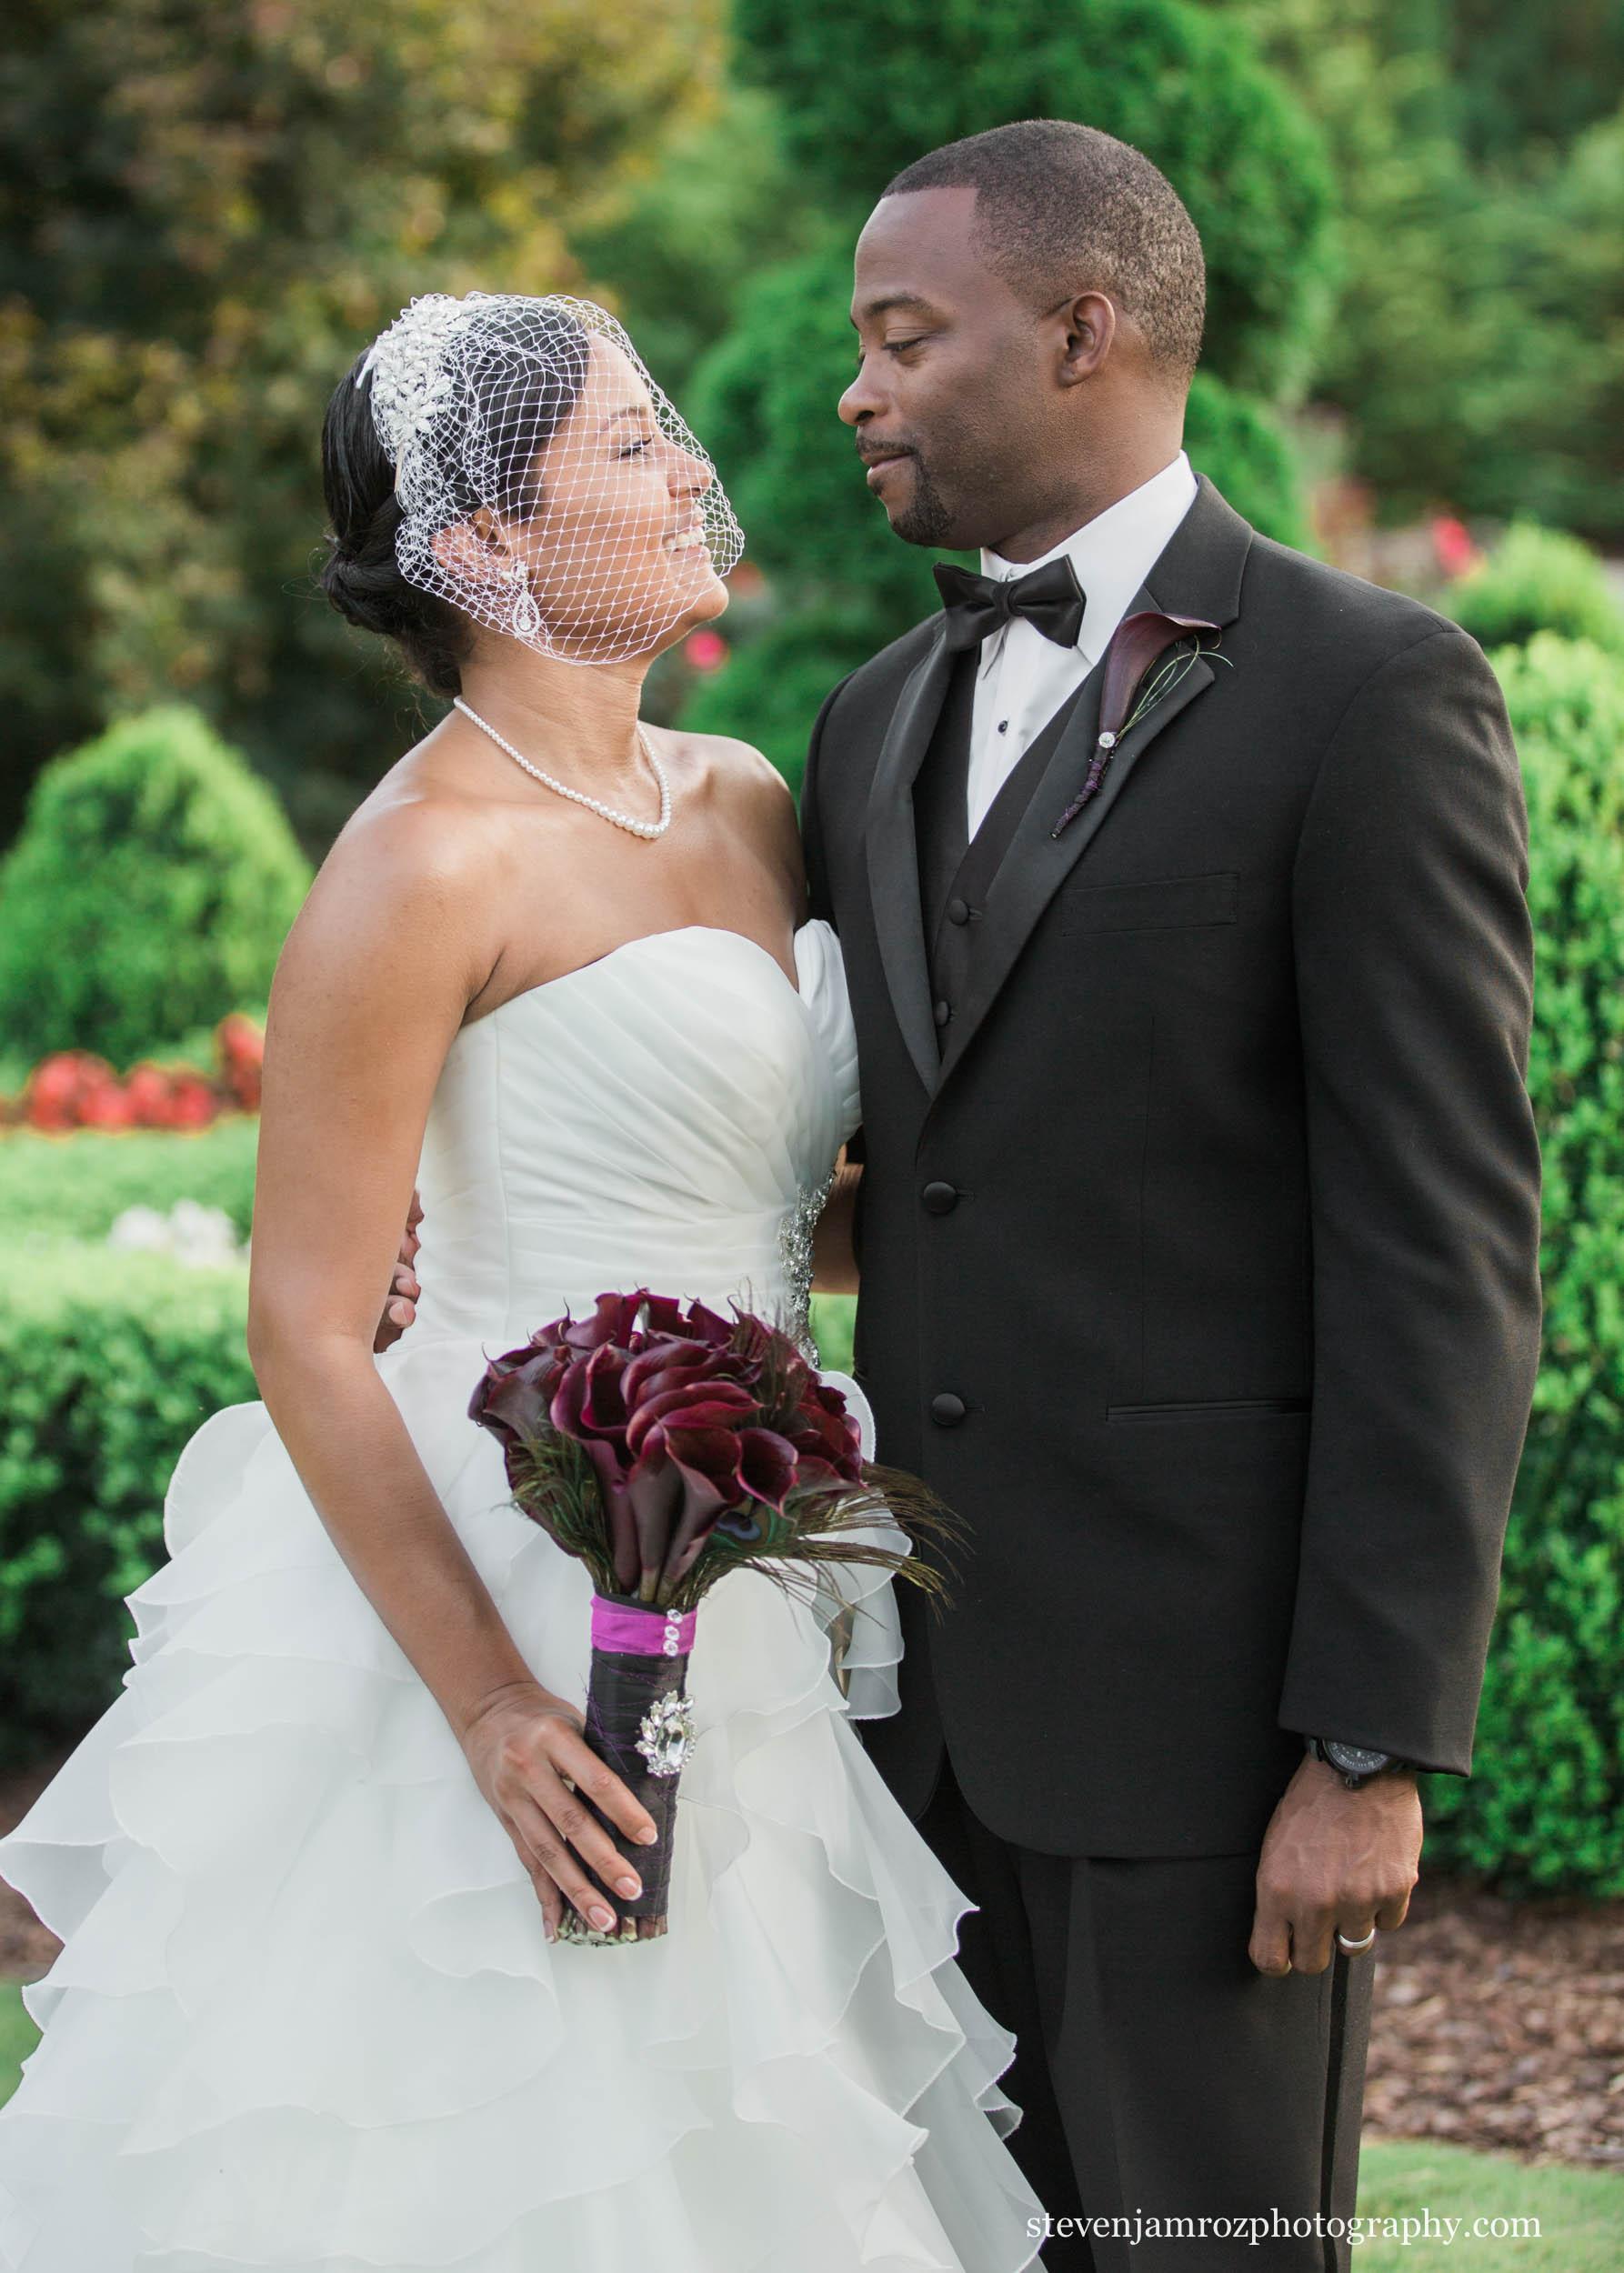 hall-at-landmark-portraits-wedding-steven-jamroz-photography-0609.jpg